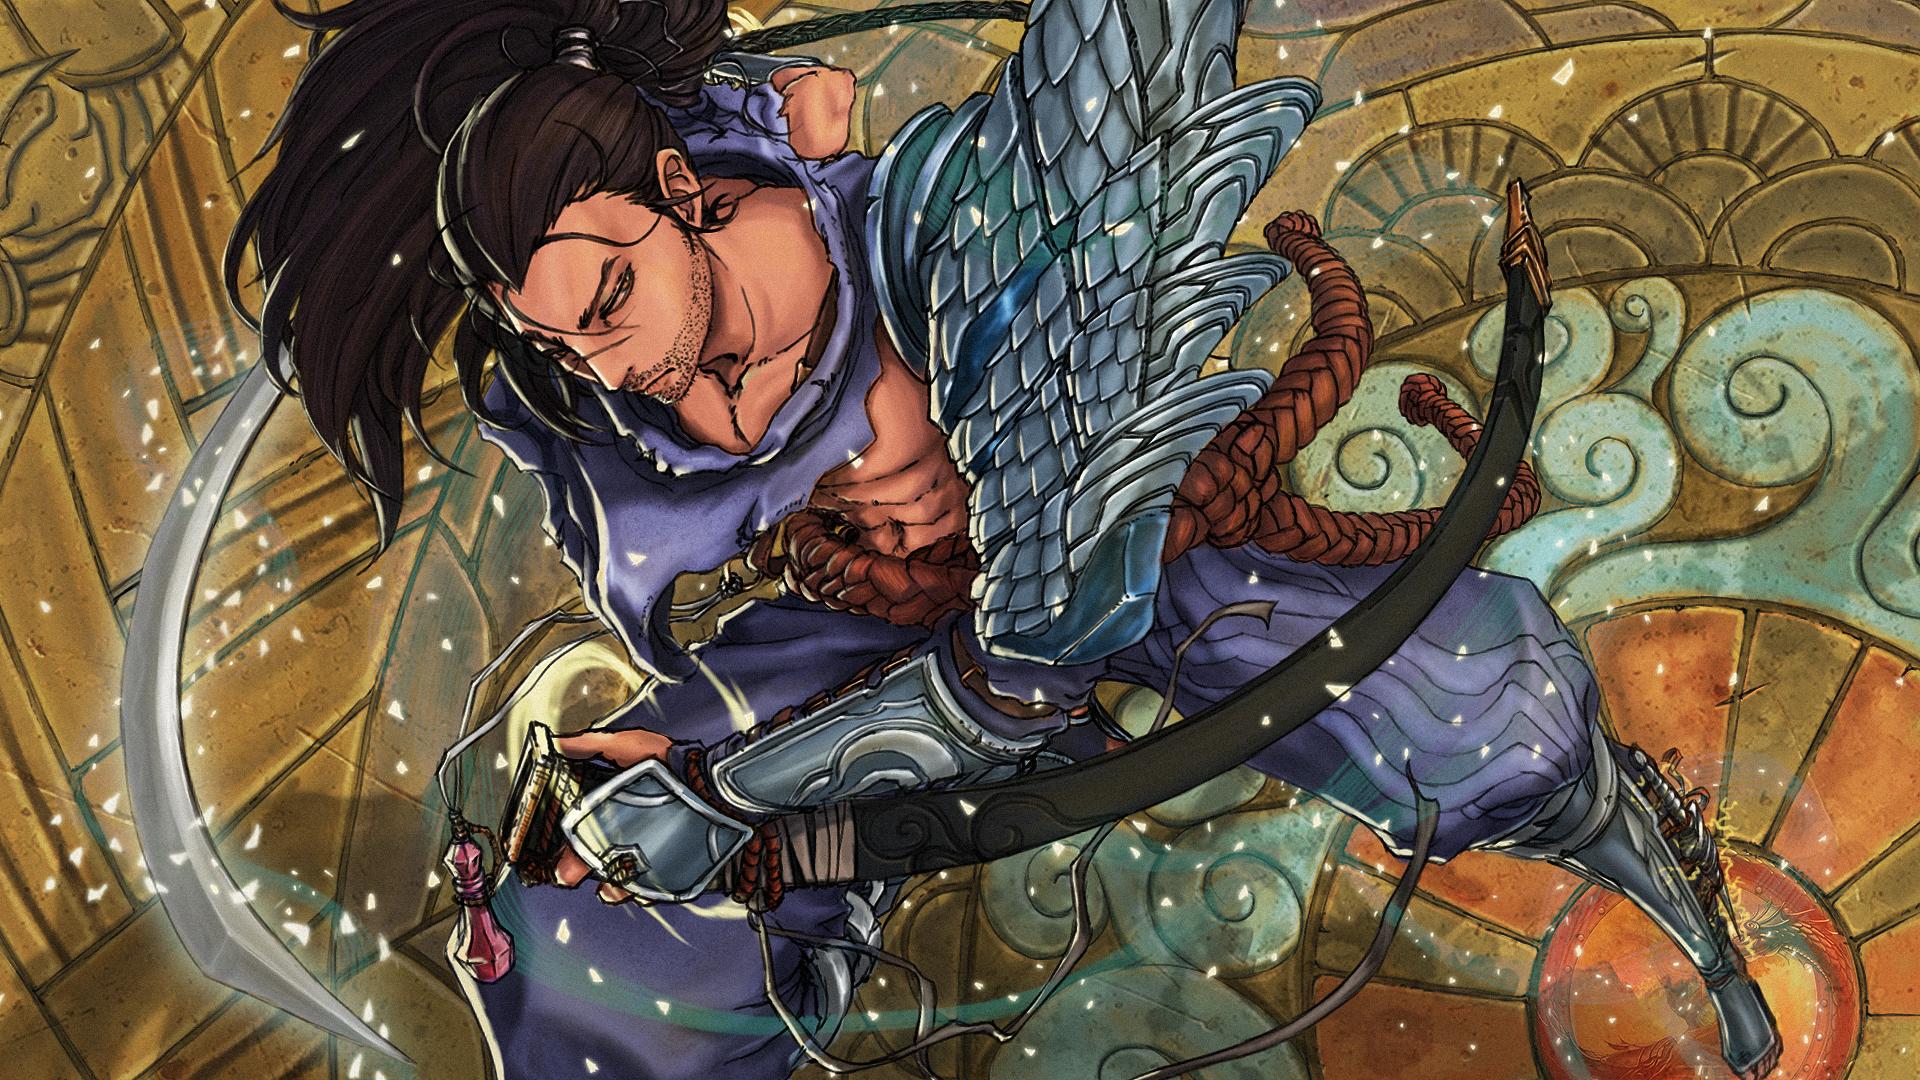 Yasuo League Of Legends Hd Wallpaper 1642262 Zerochan Anime